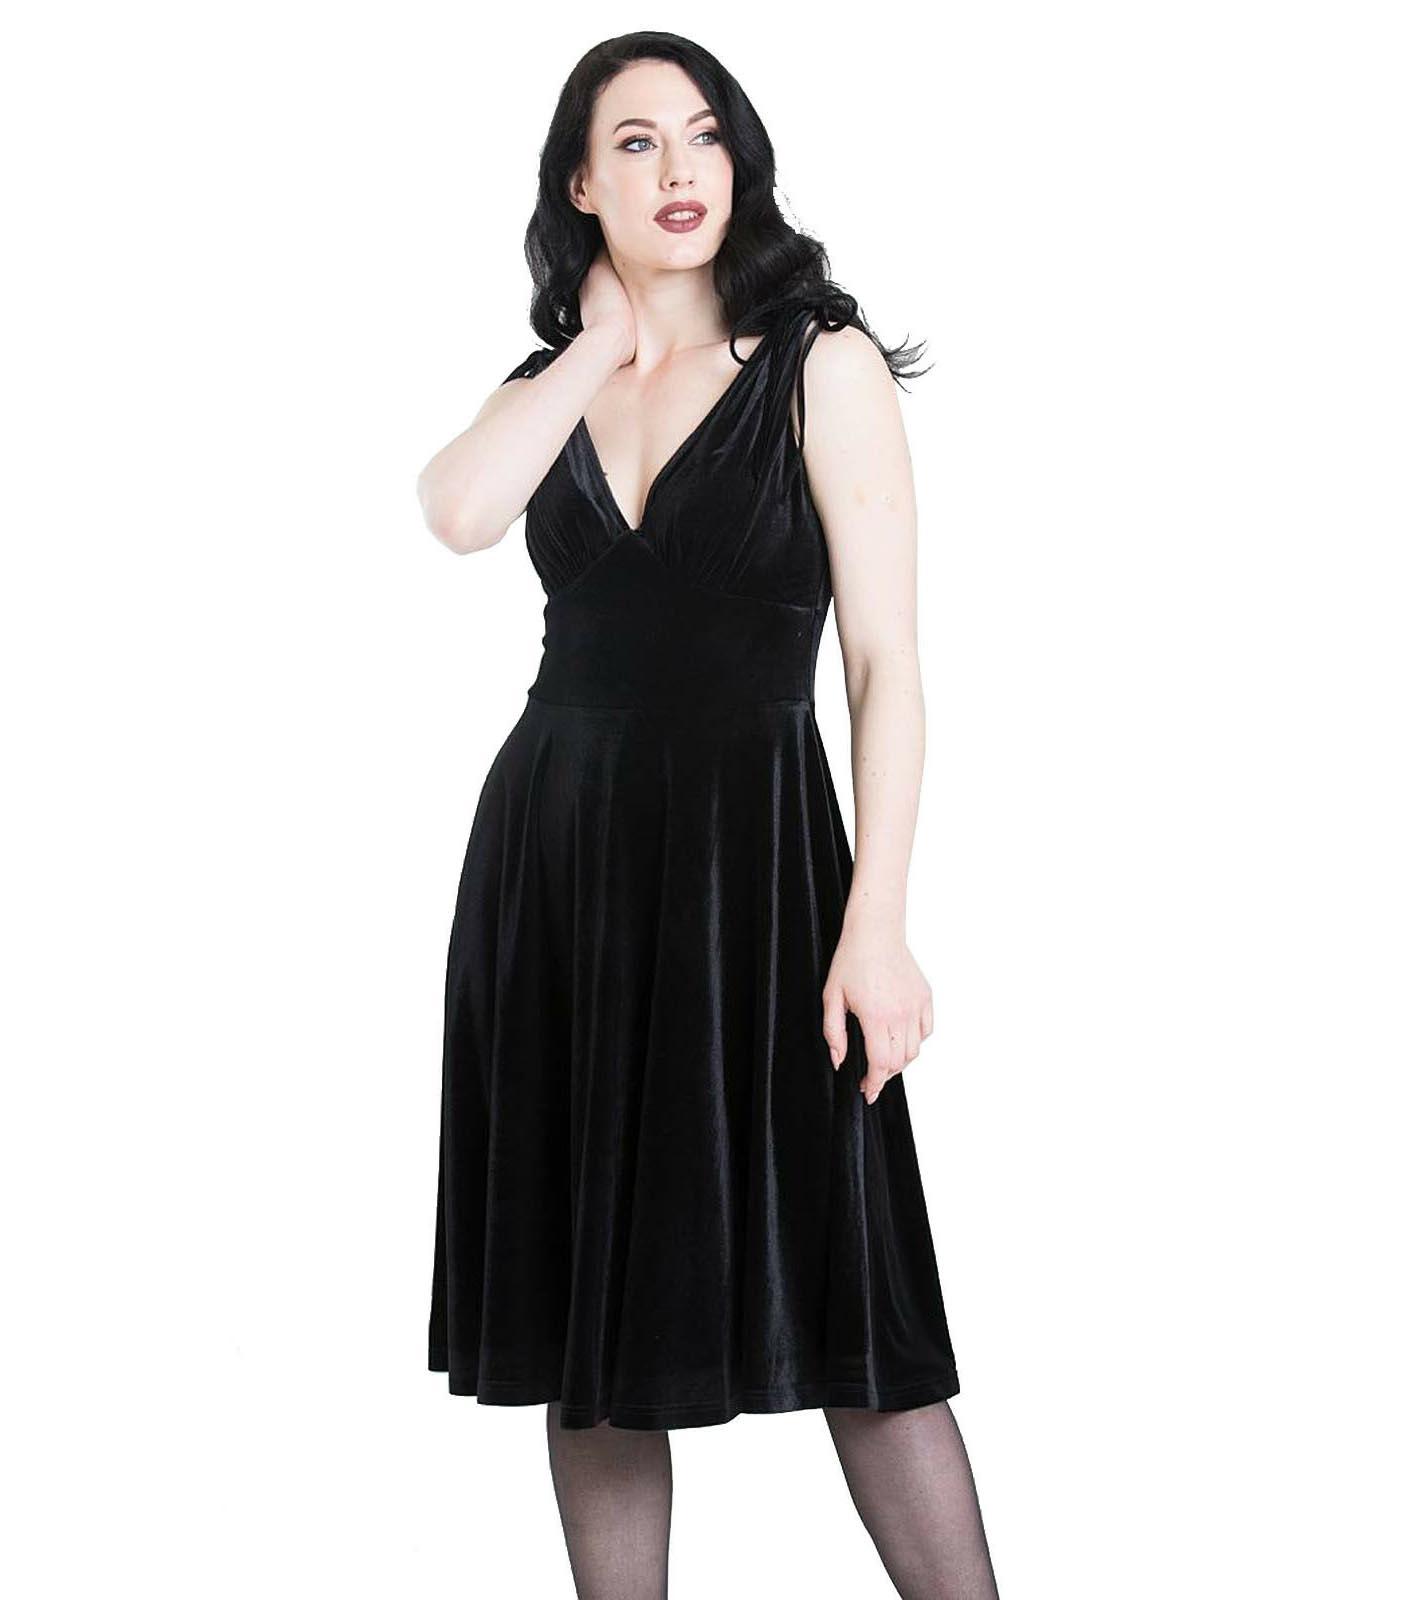 Hell-Bunny-40s-50s-Elegant-Pin-Up-Dress-MELINA-Crushed-Velvet-Black-All-Sizes thumbnail 23